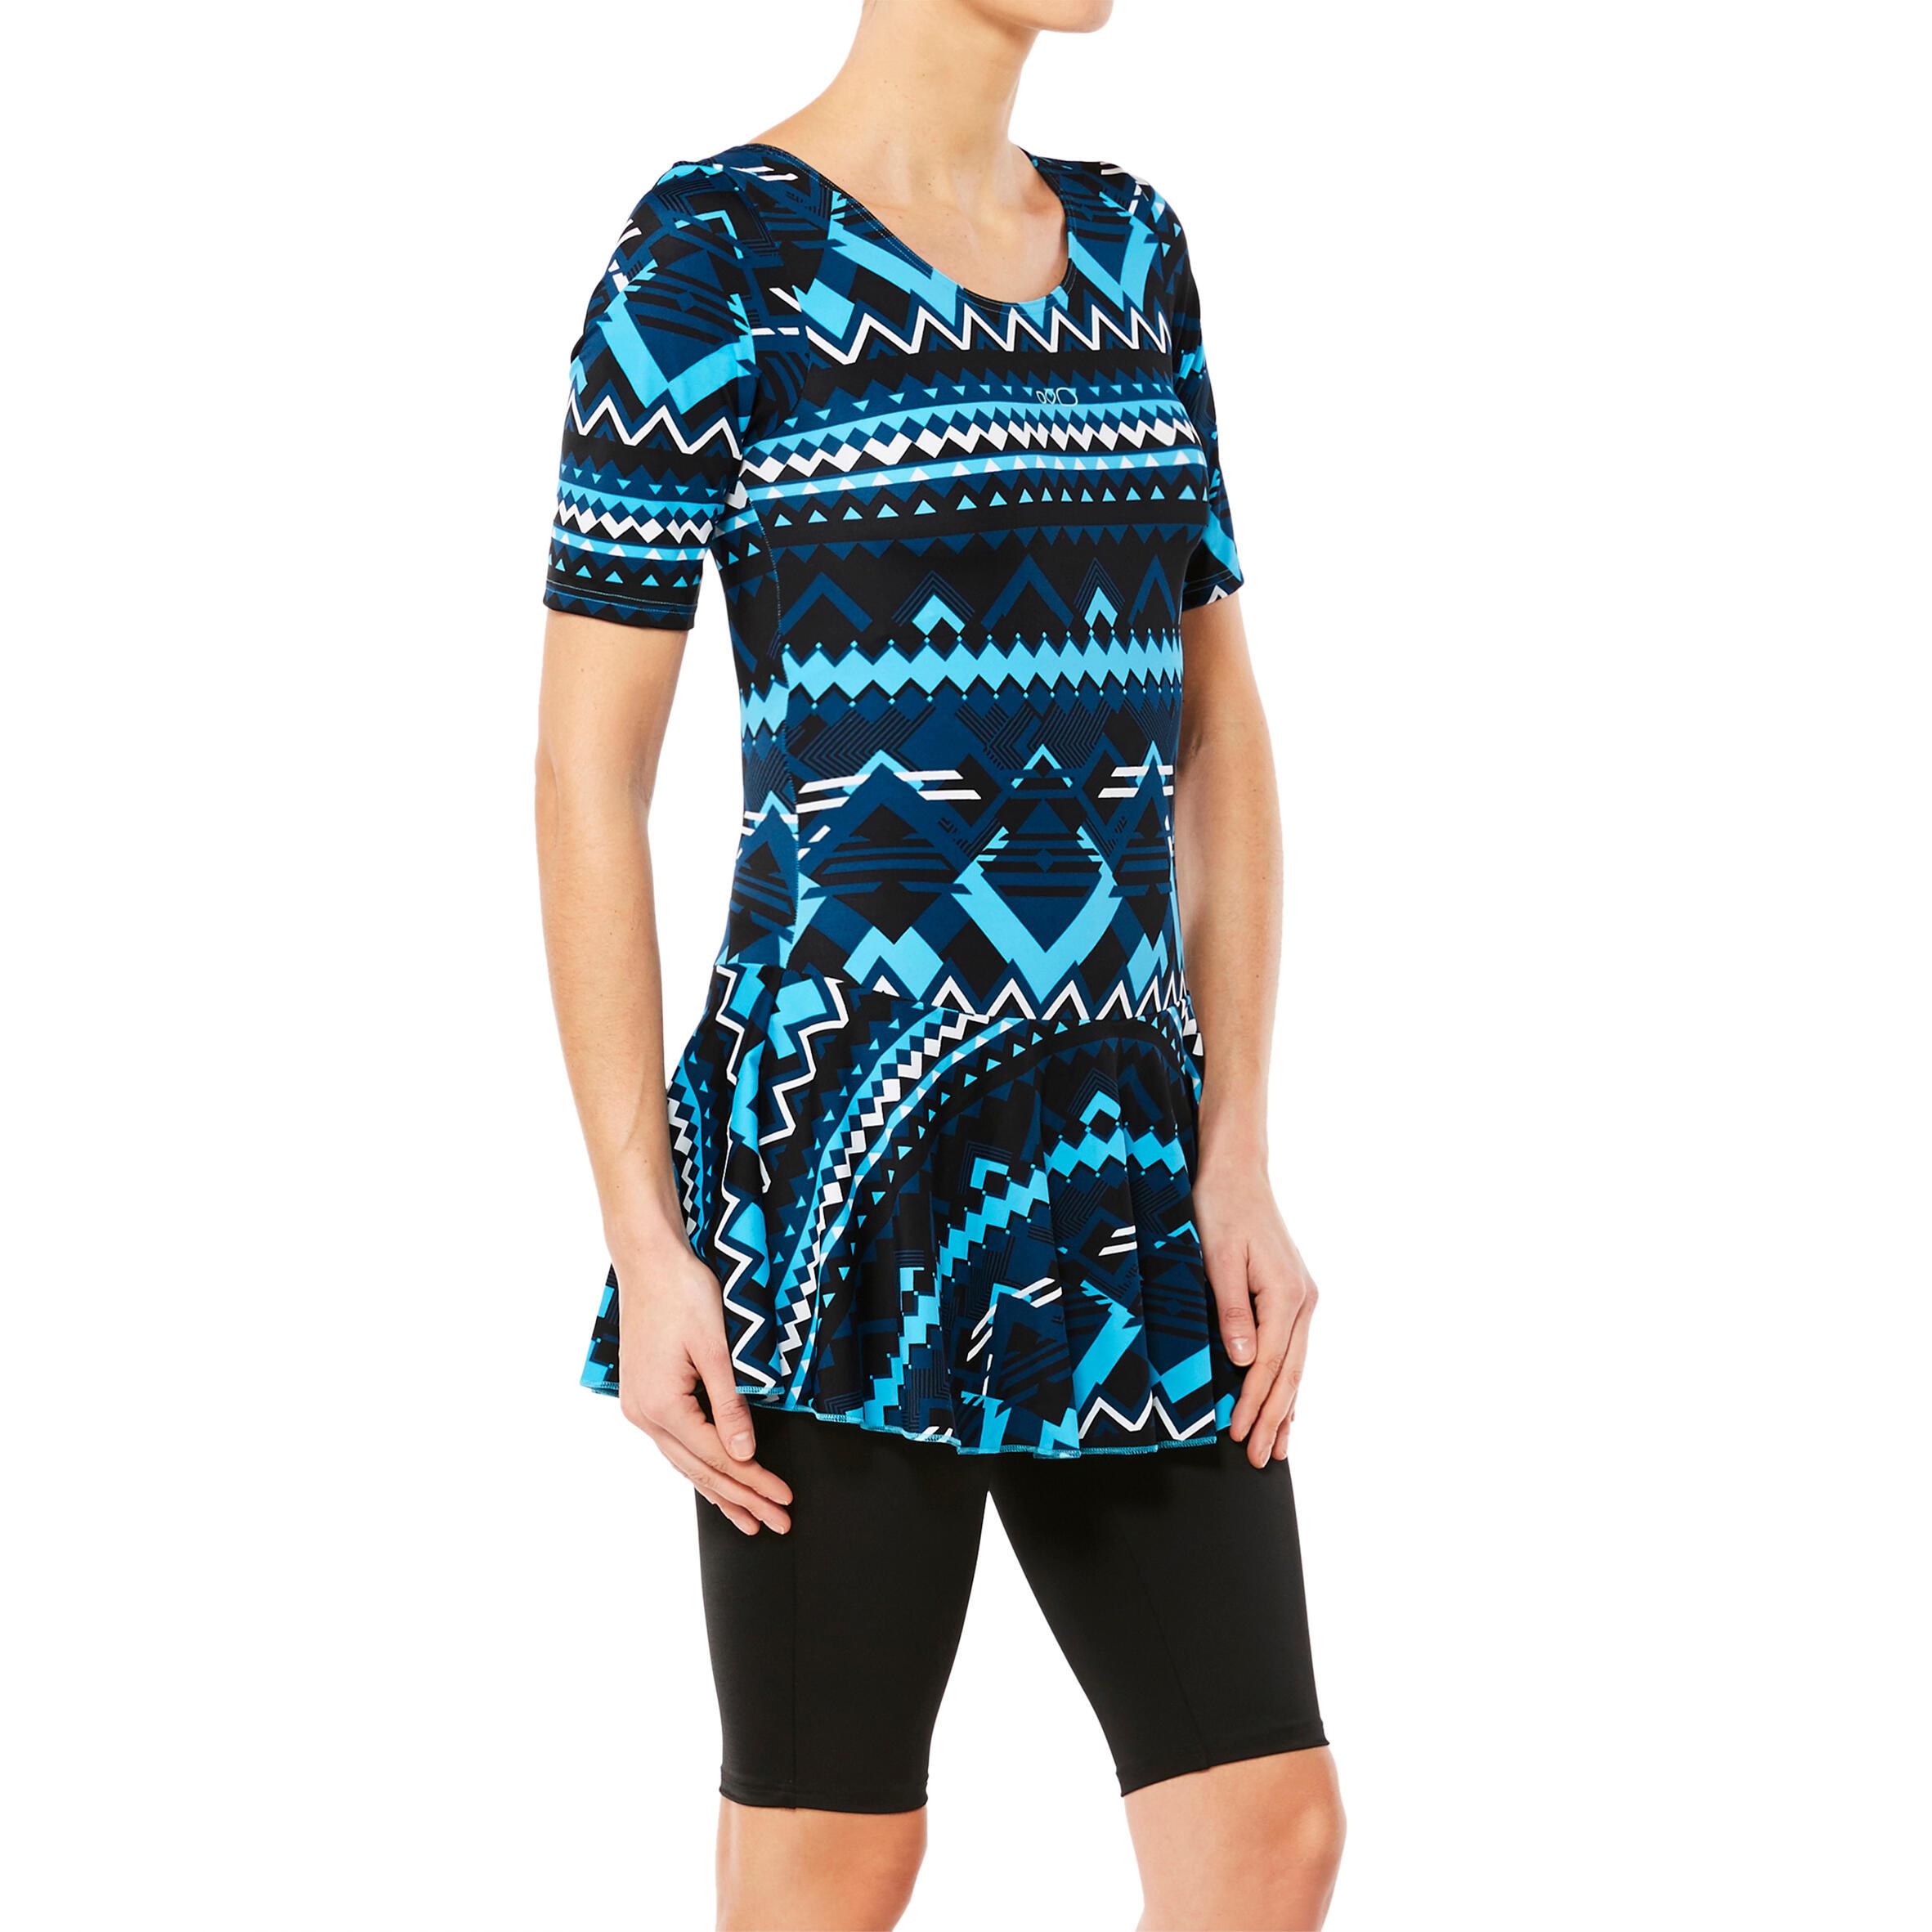 Audrey Women's One-Piece Jammer Swimsuit - Kal Blue